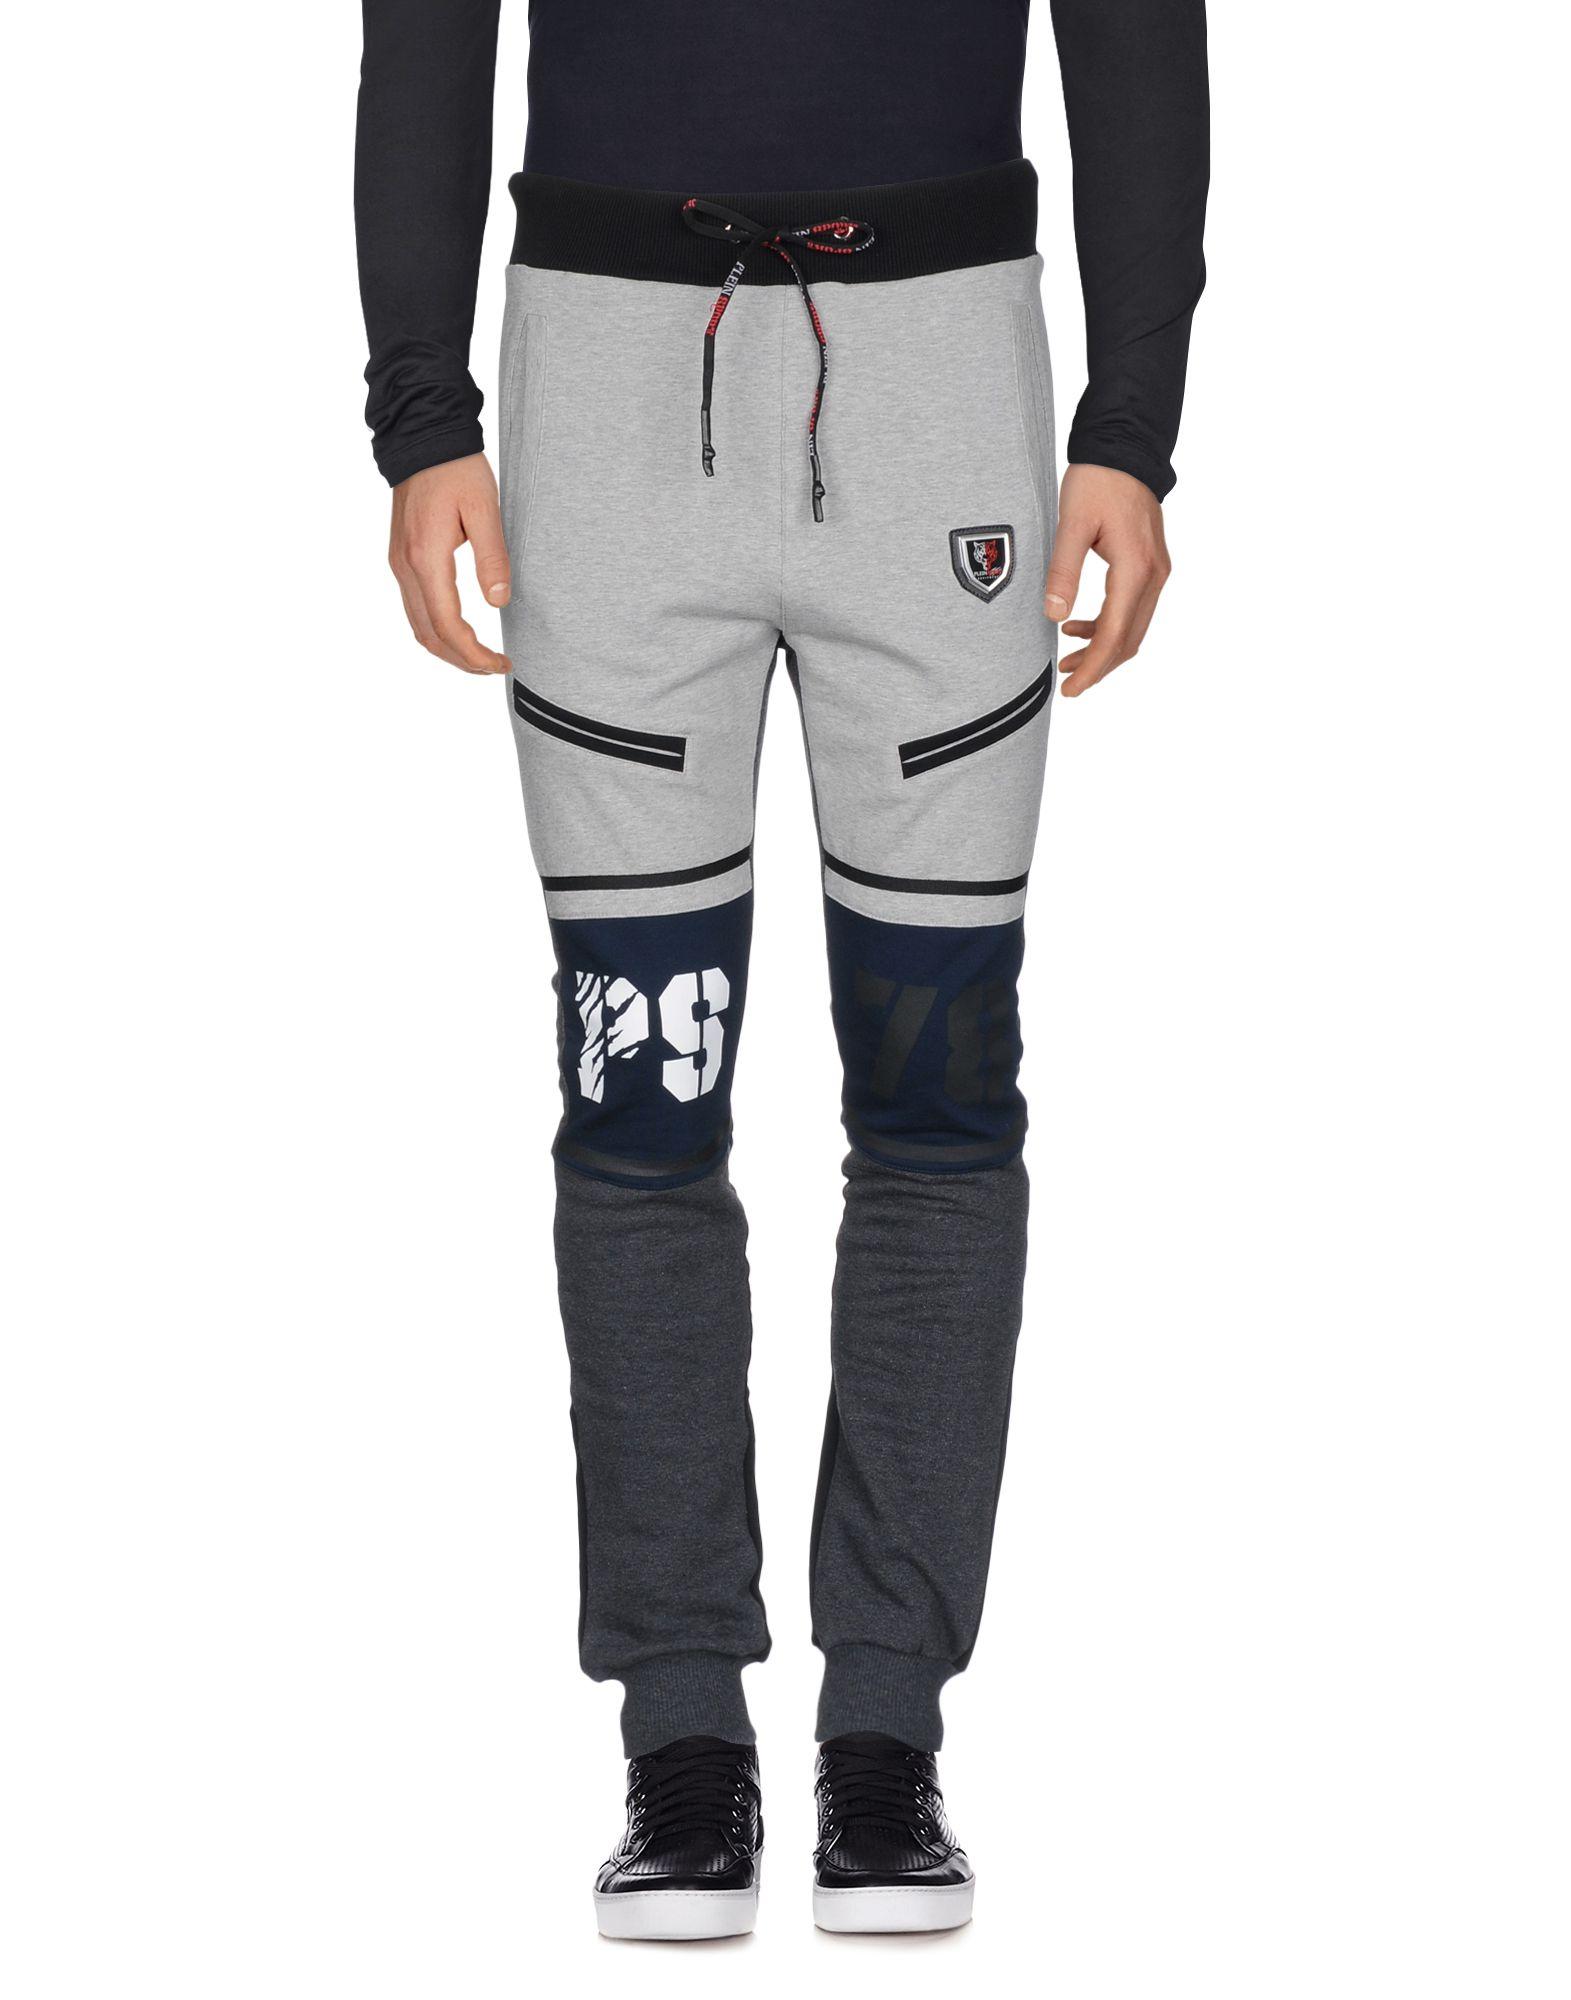 Pantalone Plein Sport Uomo - Acquista online su